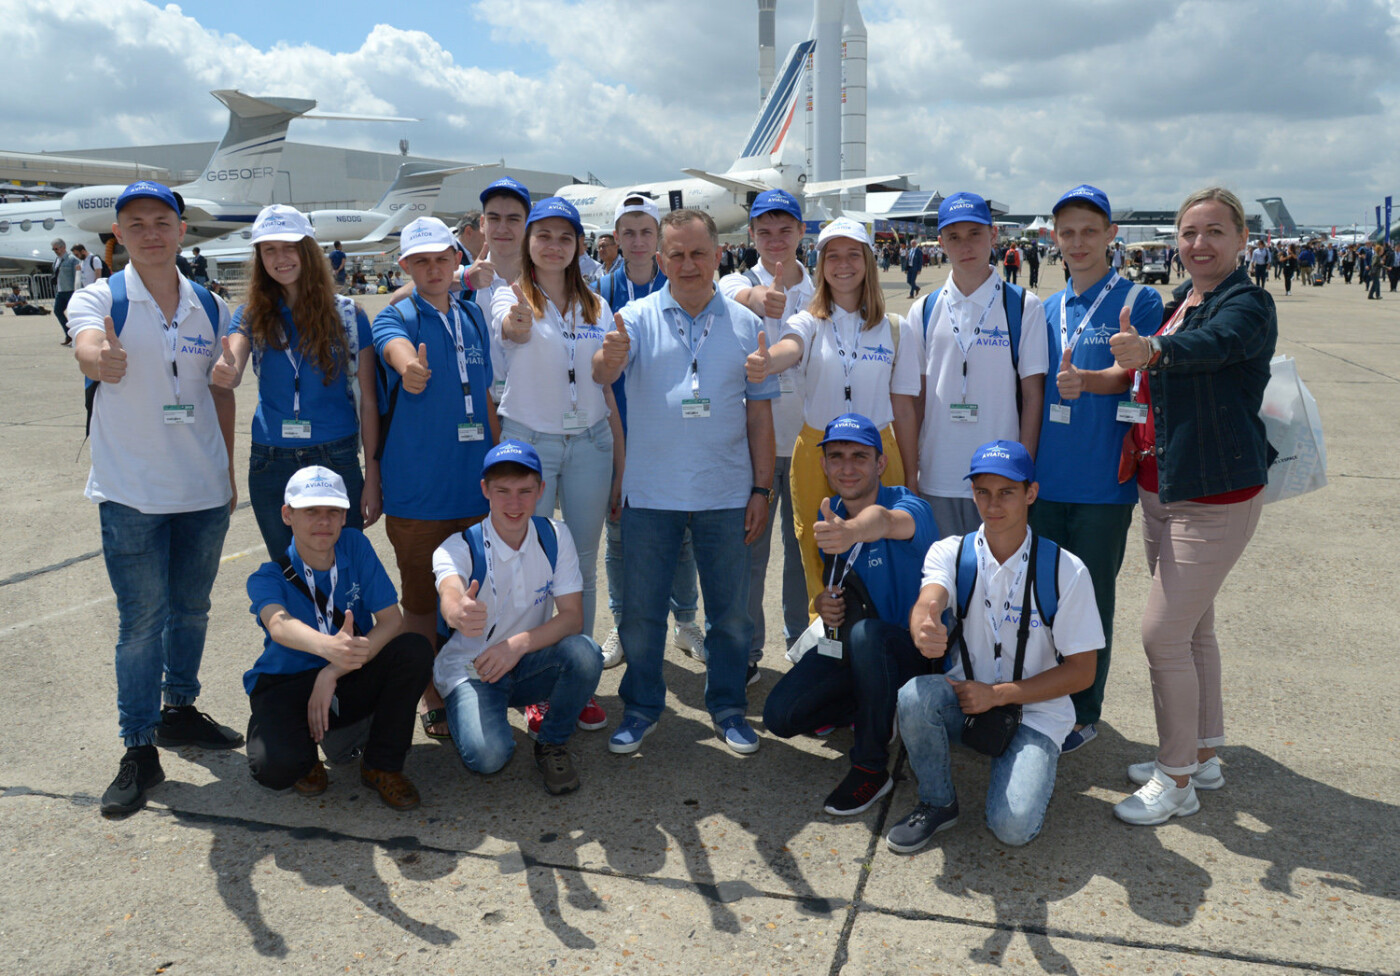 Борис Колесников со школьниками Донбасса посетил крупнейший авиасалон во Франции, фото-7